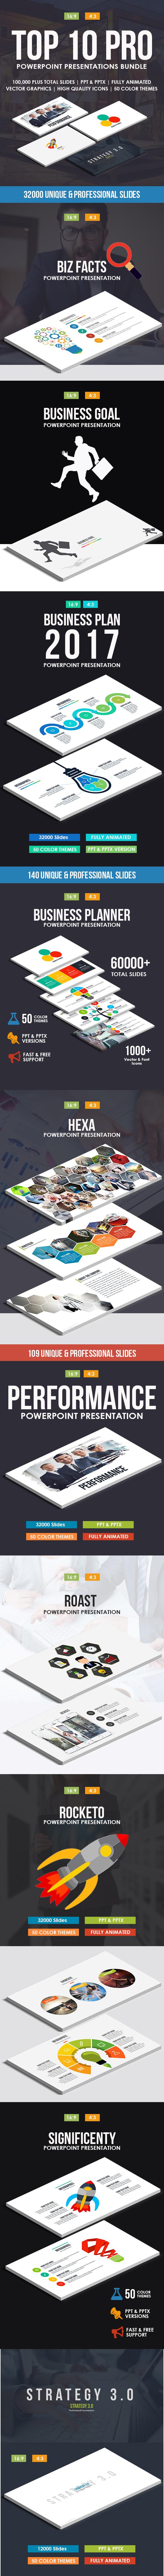 Top 10 IN 1 Pro Powerpoint Templates Bundle